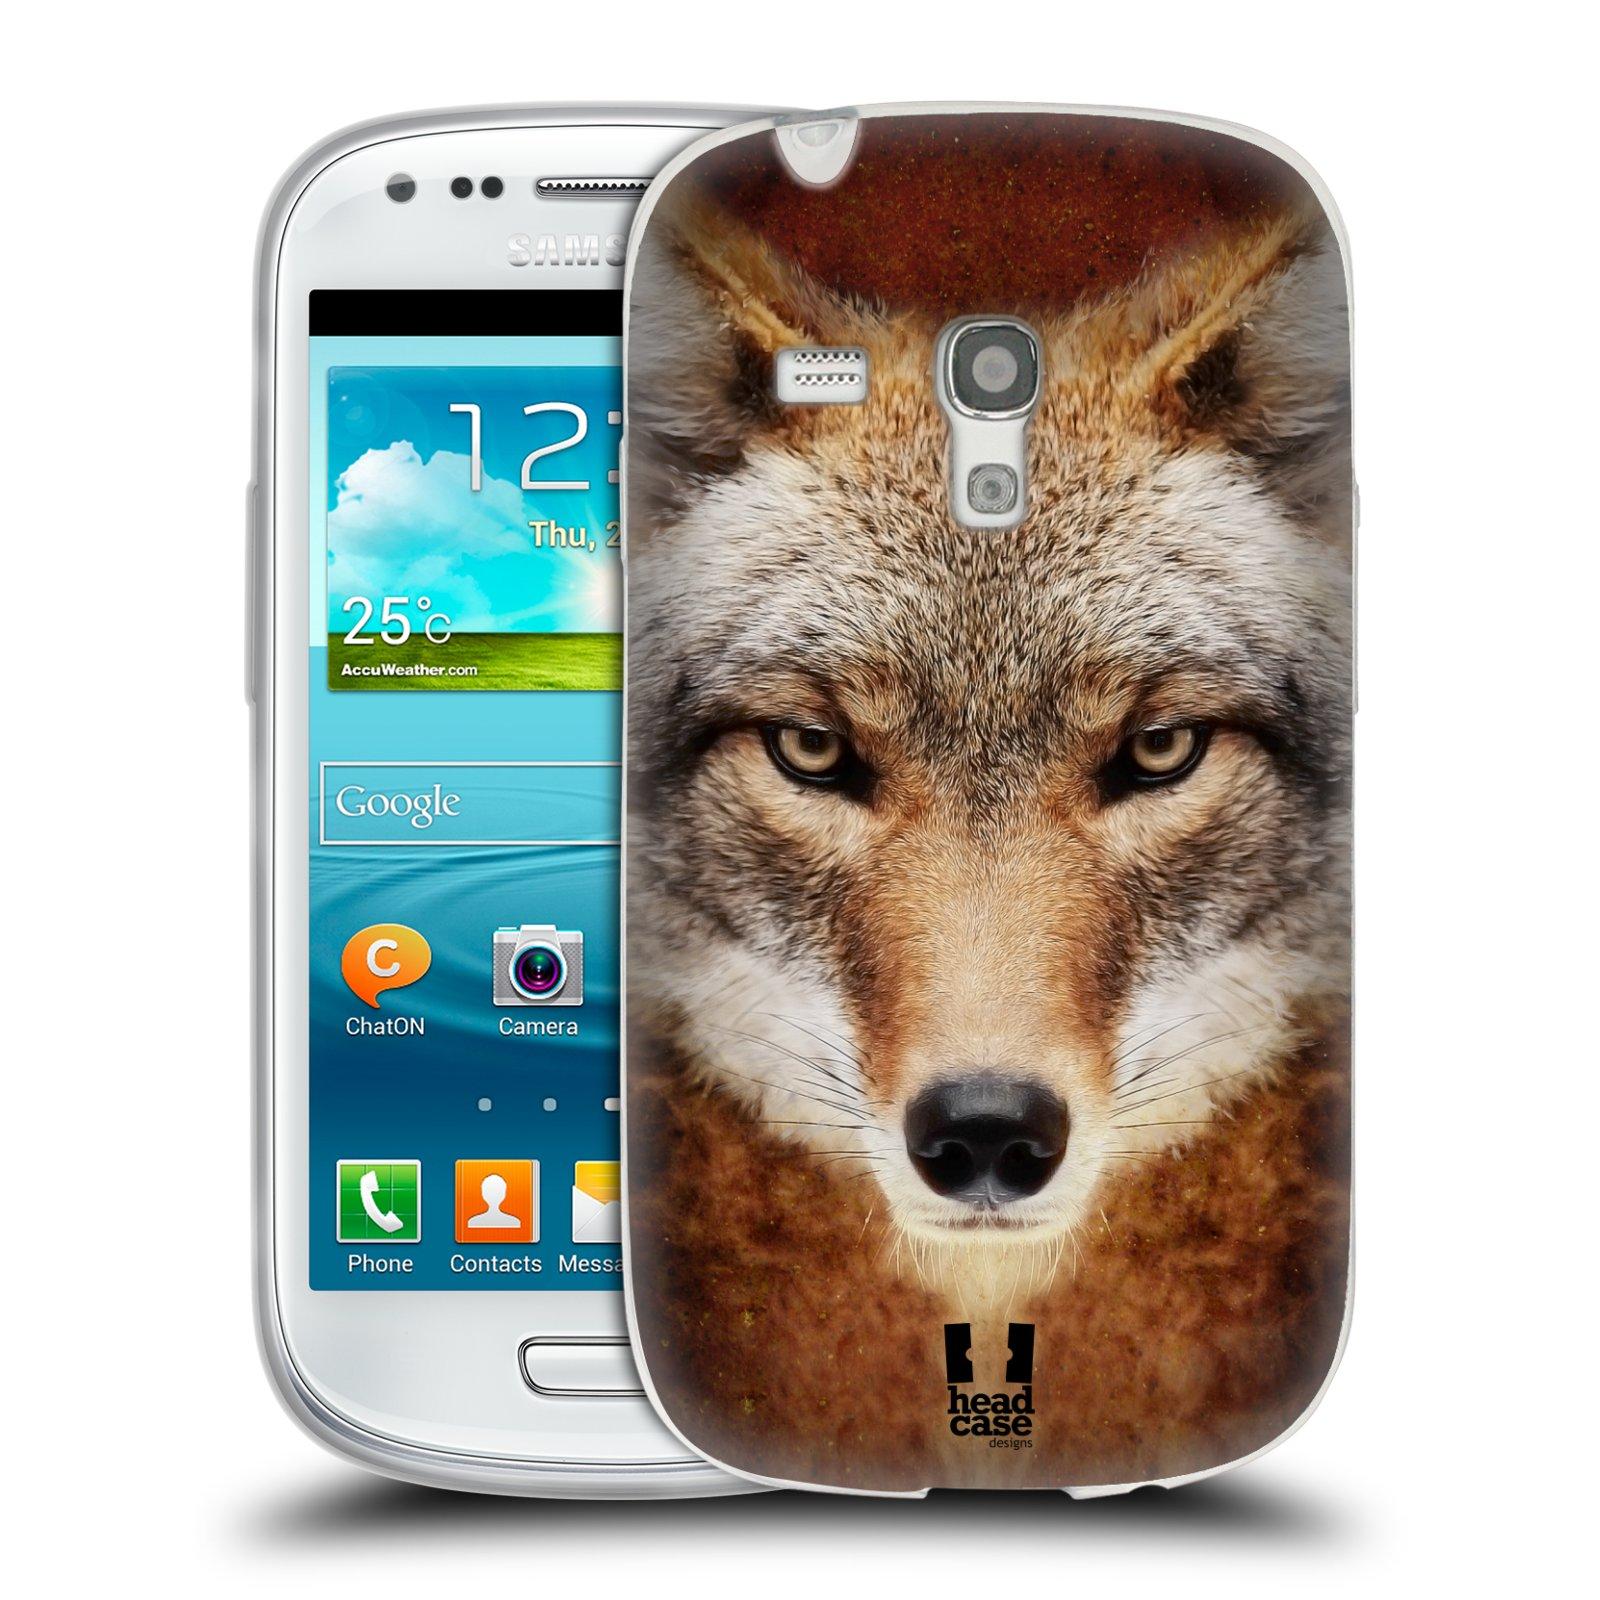 HEAD CASE silikonový obal na mobil Samsung Galaxy S3 MINI i8190 vzor Zvířecí tváře kojot